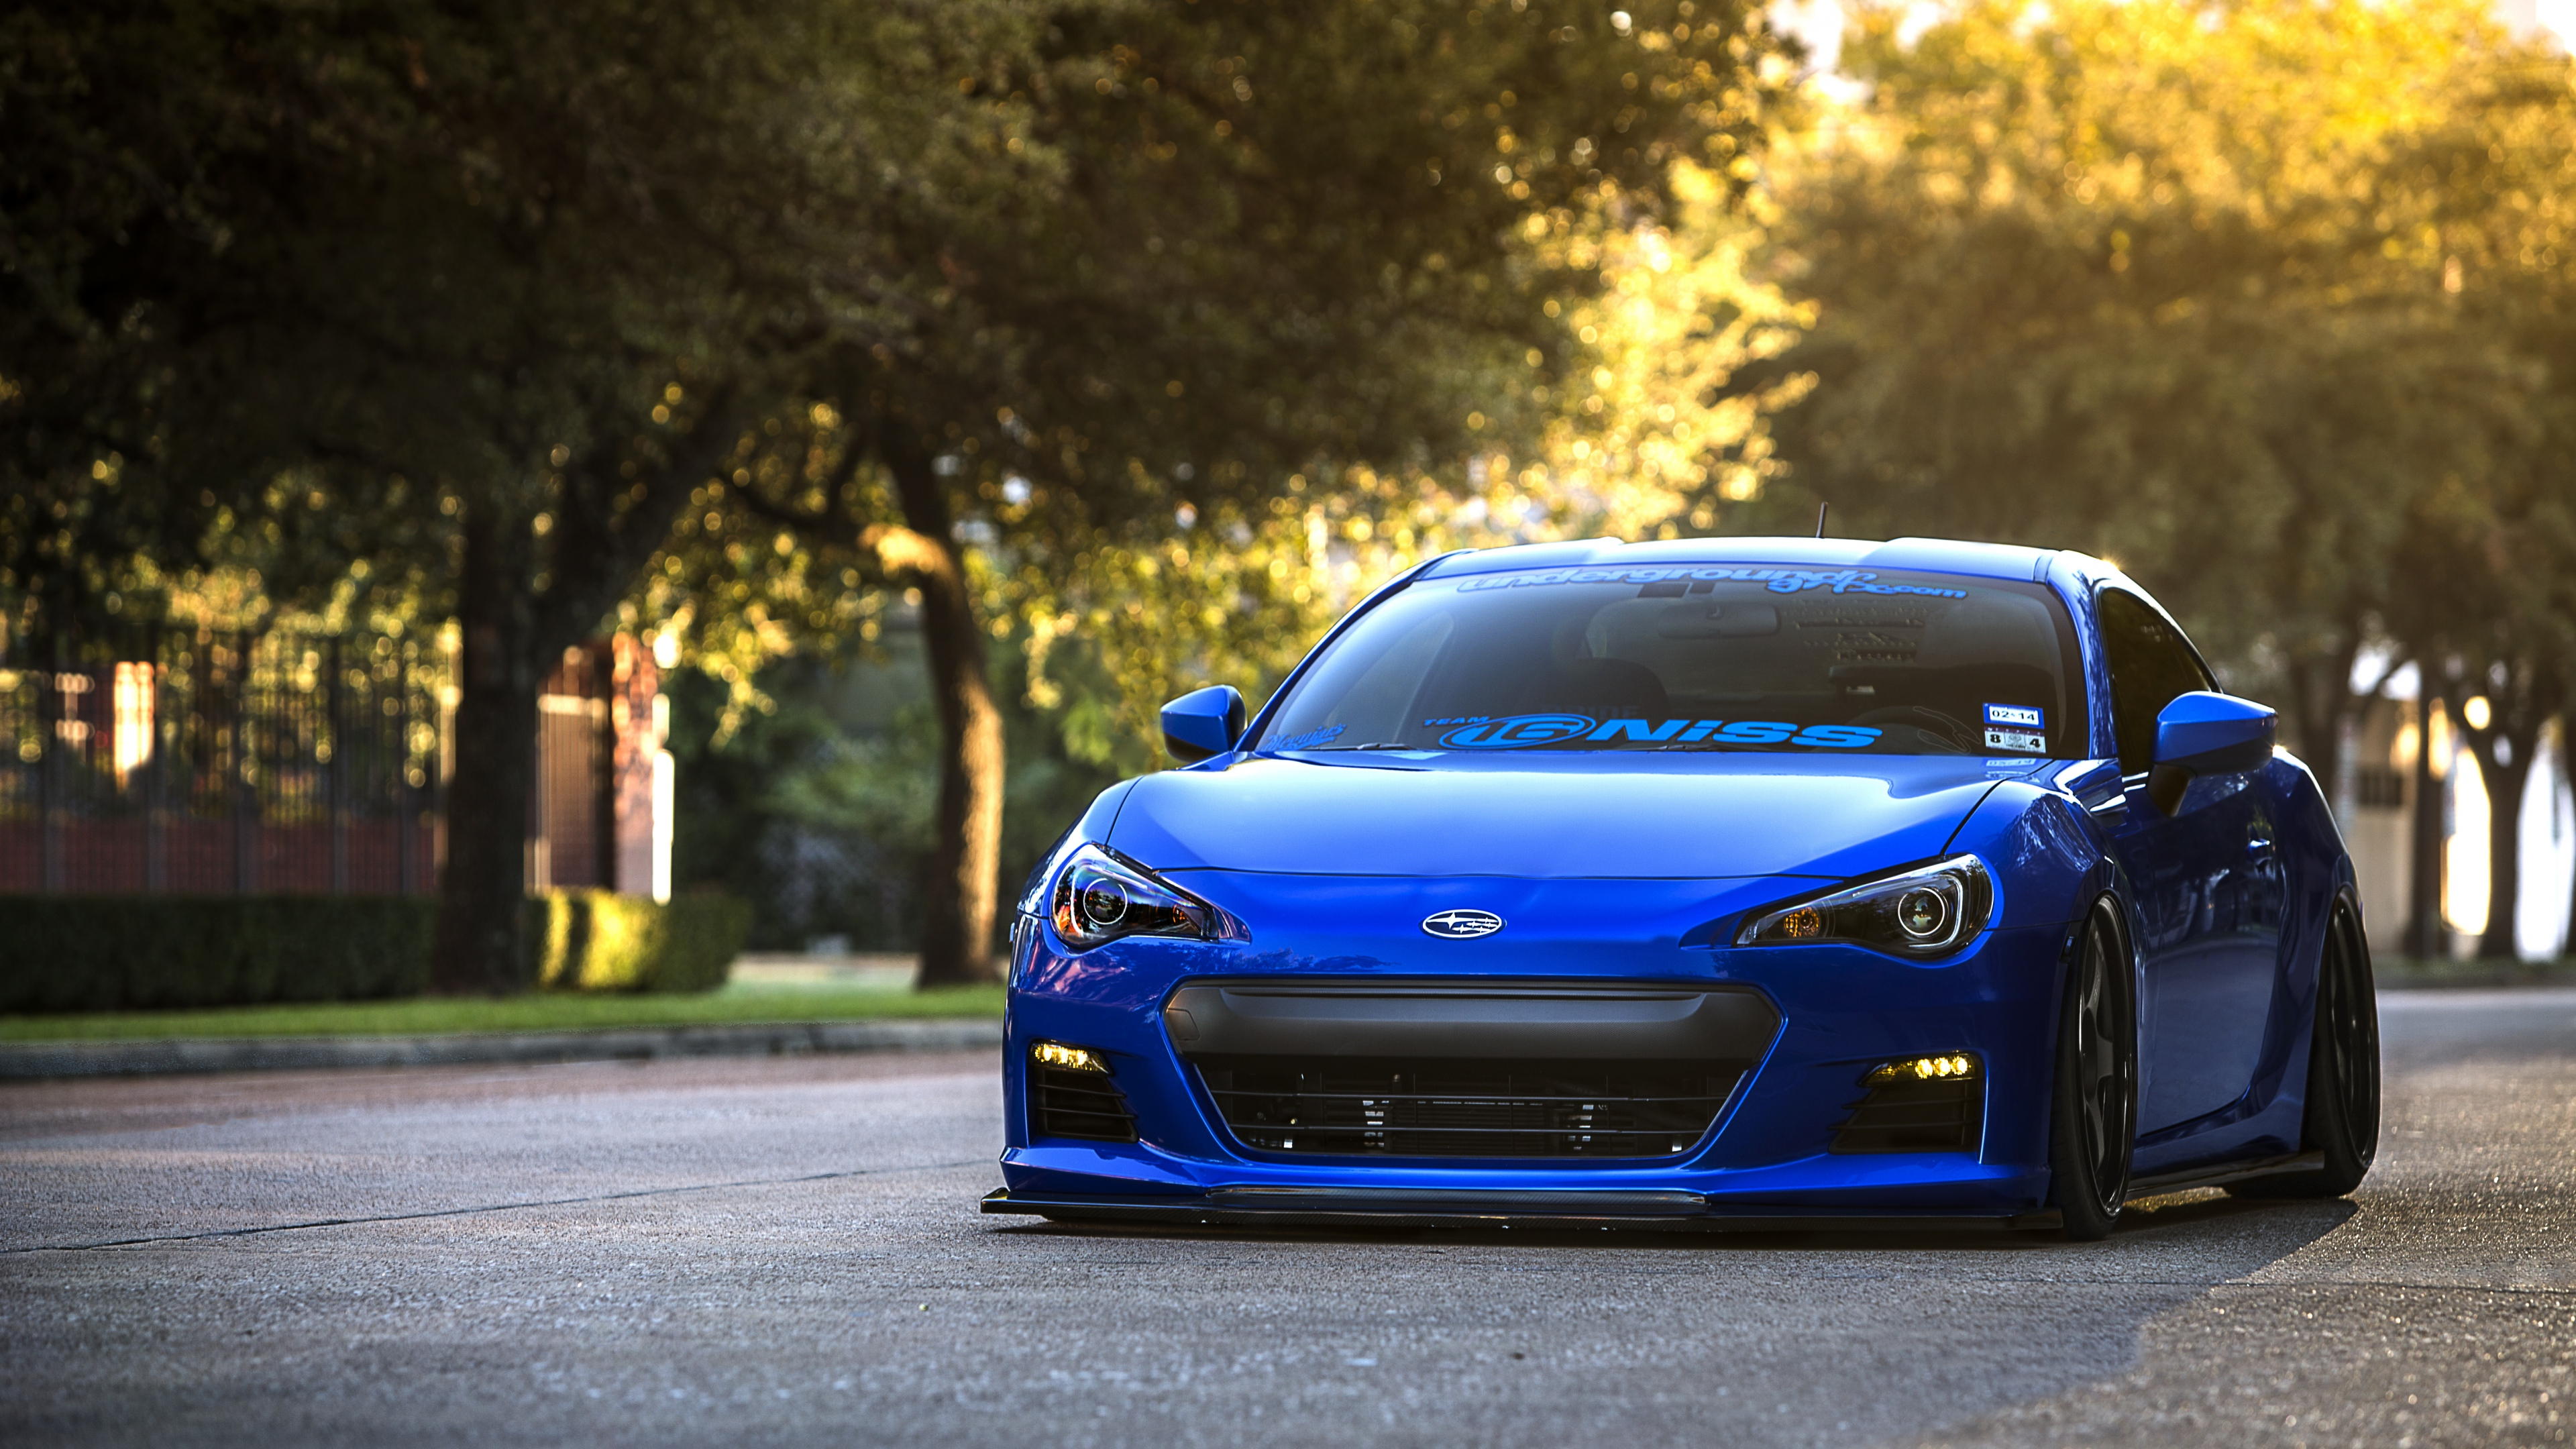 HD Wallpaper 38402160 subaru brz blue front sports car coupe 4K 3840x2160